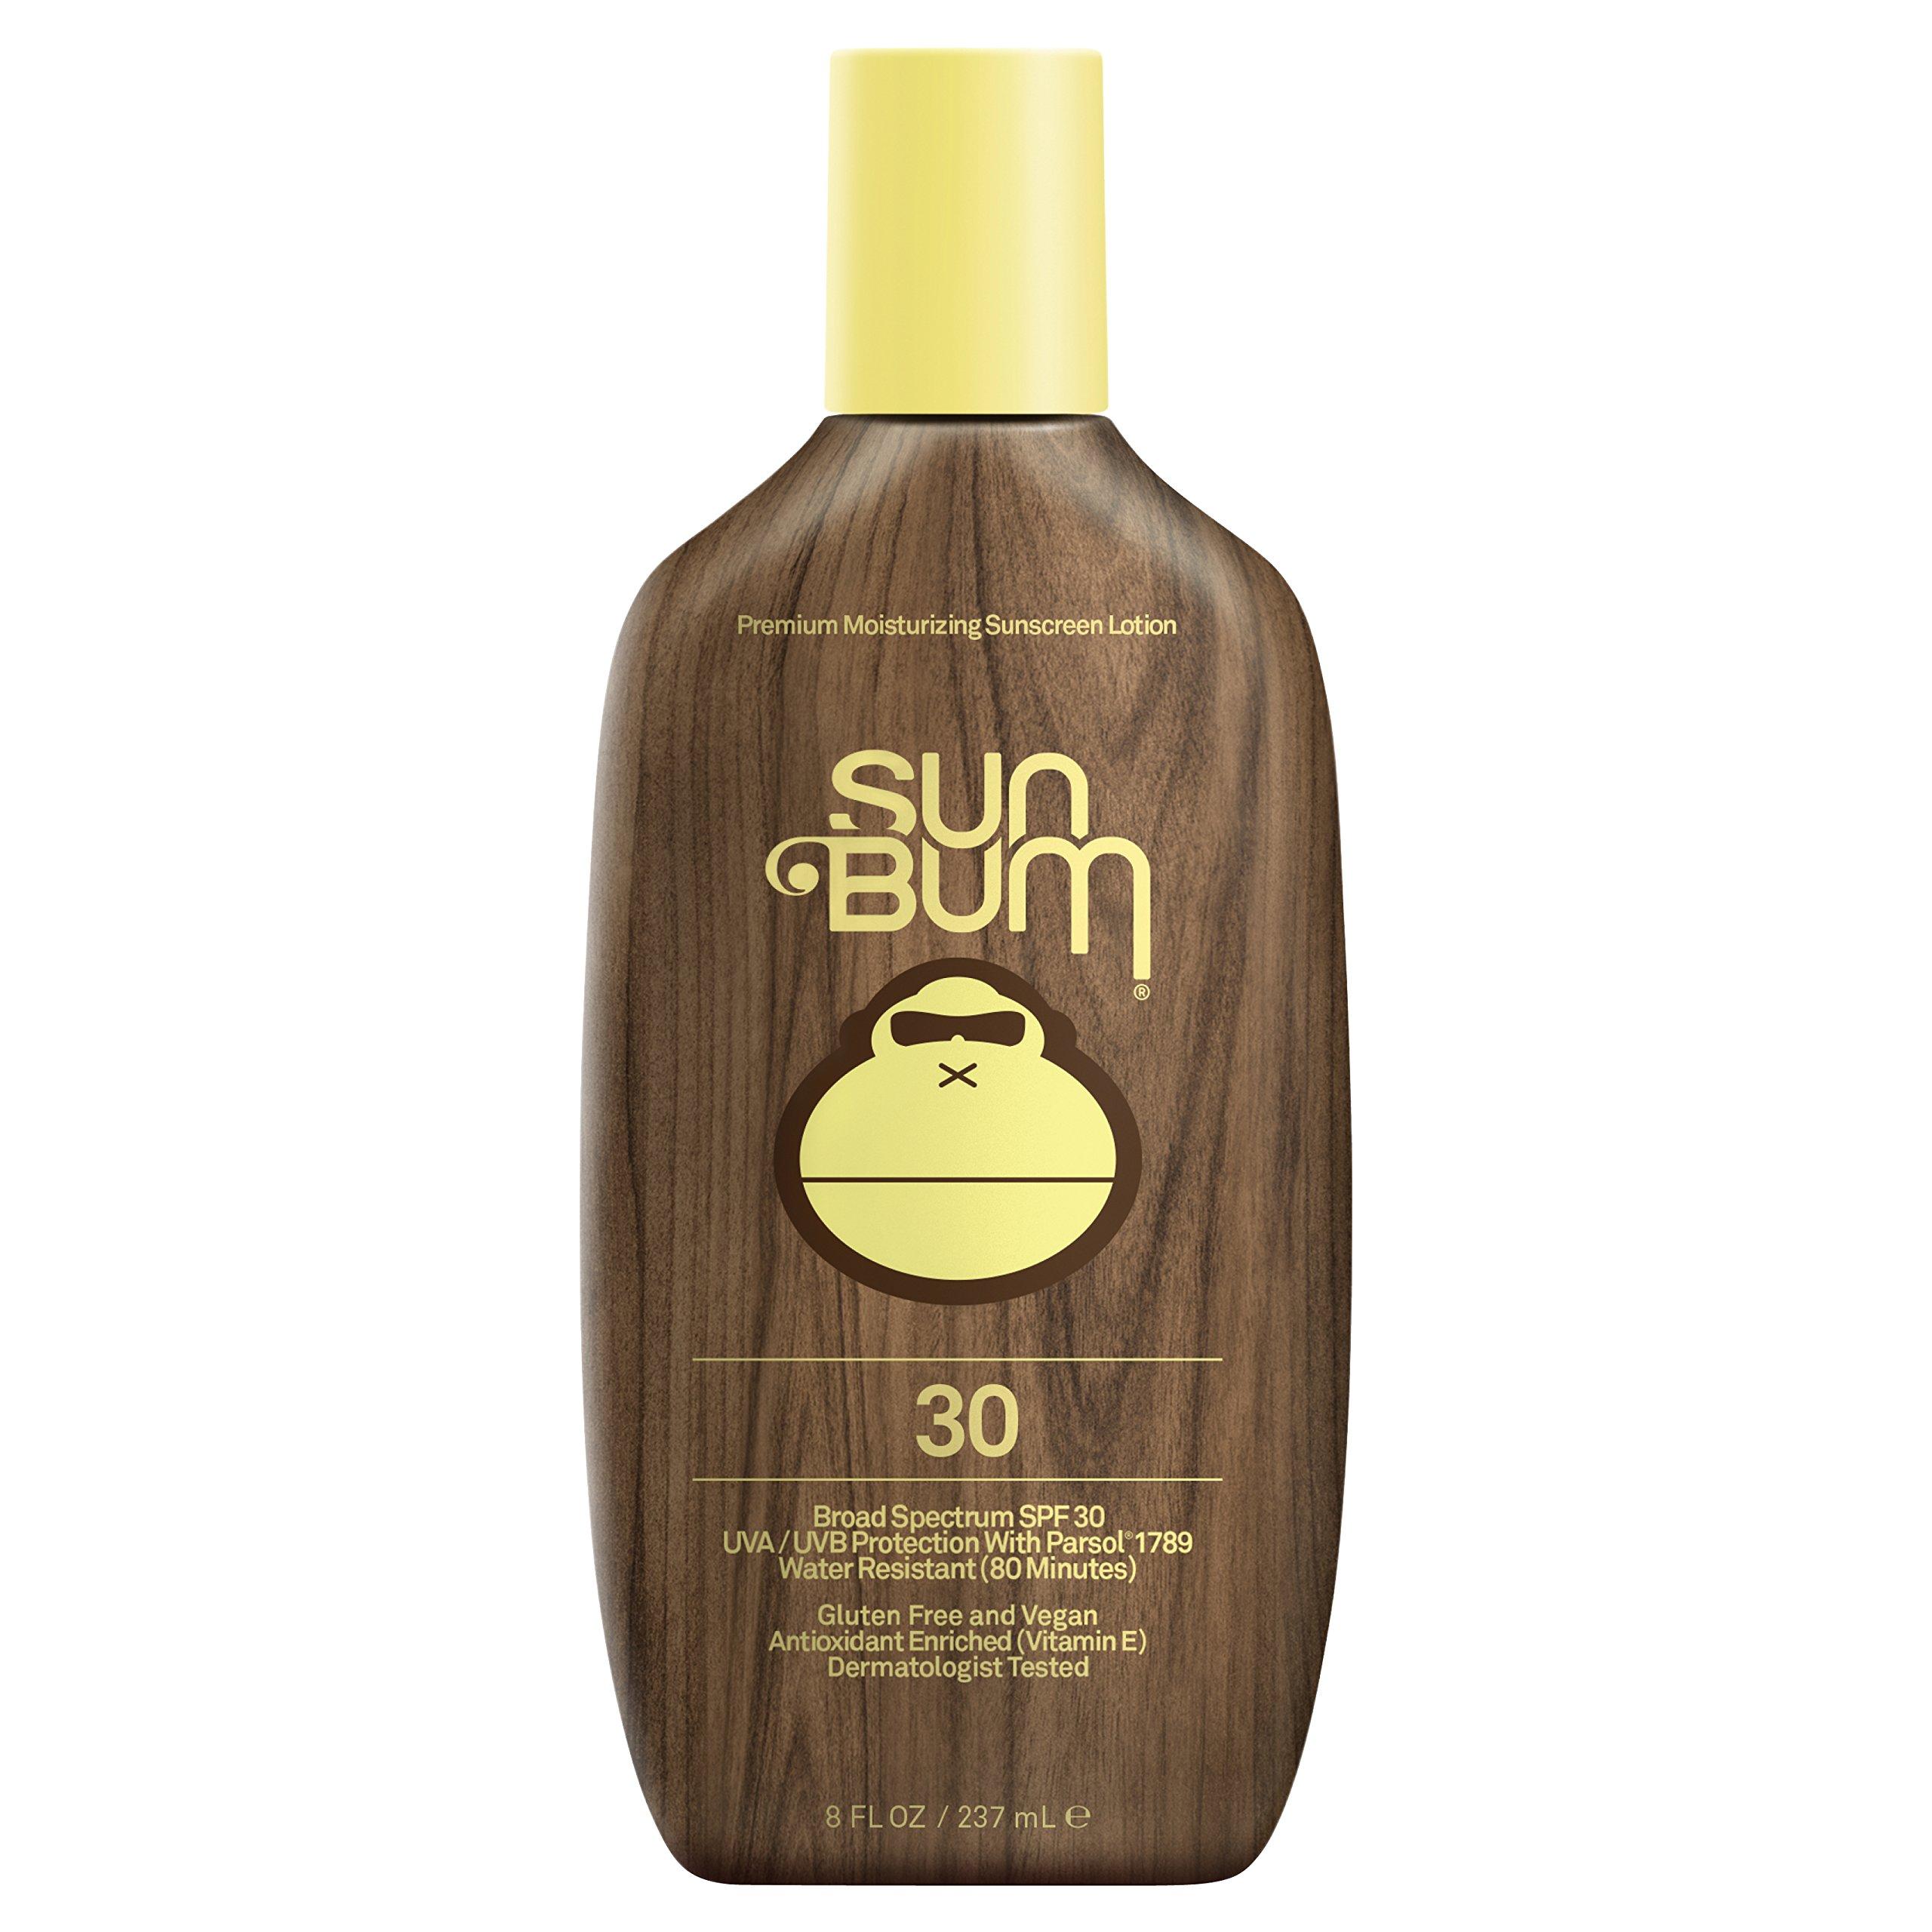 Sun Bum Original Moisturizing Sunscreen Lotion, SPF 30, 8 oz. Bottle, 1 Count, Broad Spectrum UVA/UVB Protection, Hypoallergenic, Paraben Free, Gluten Free